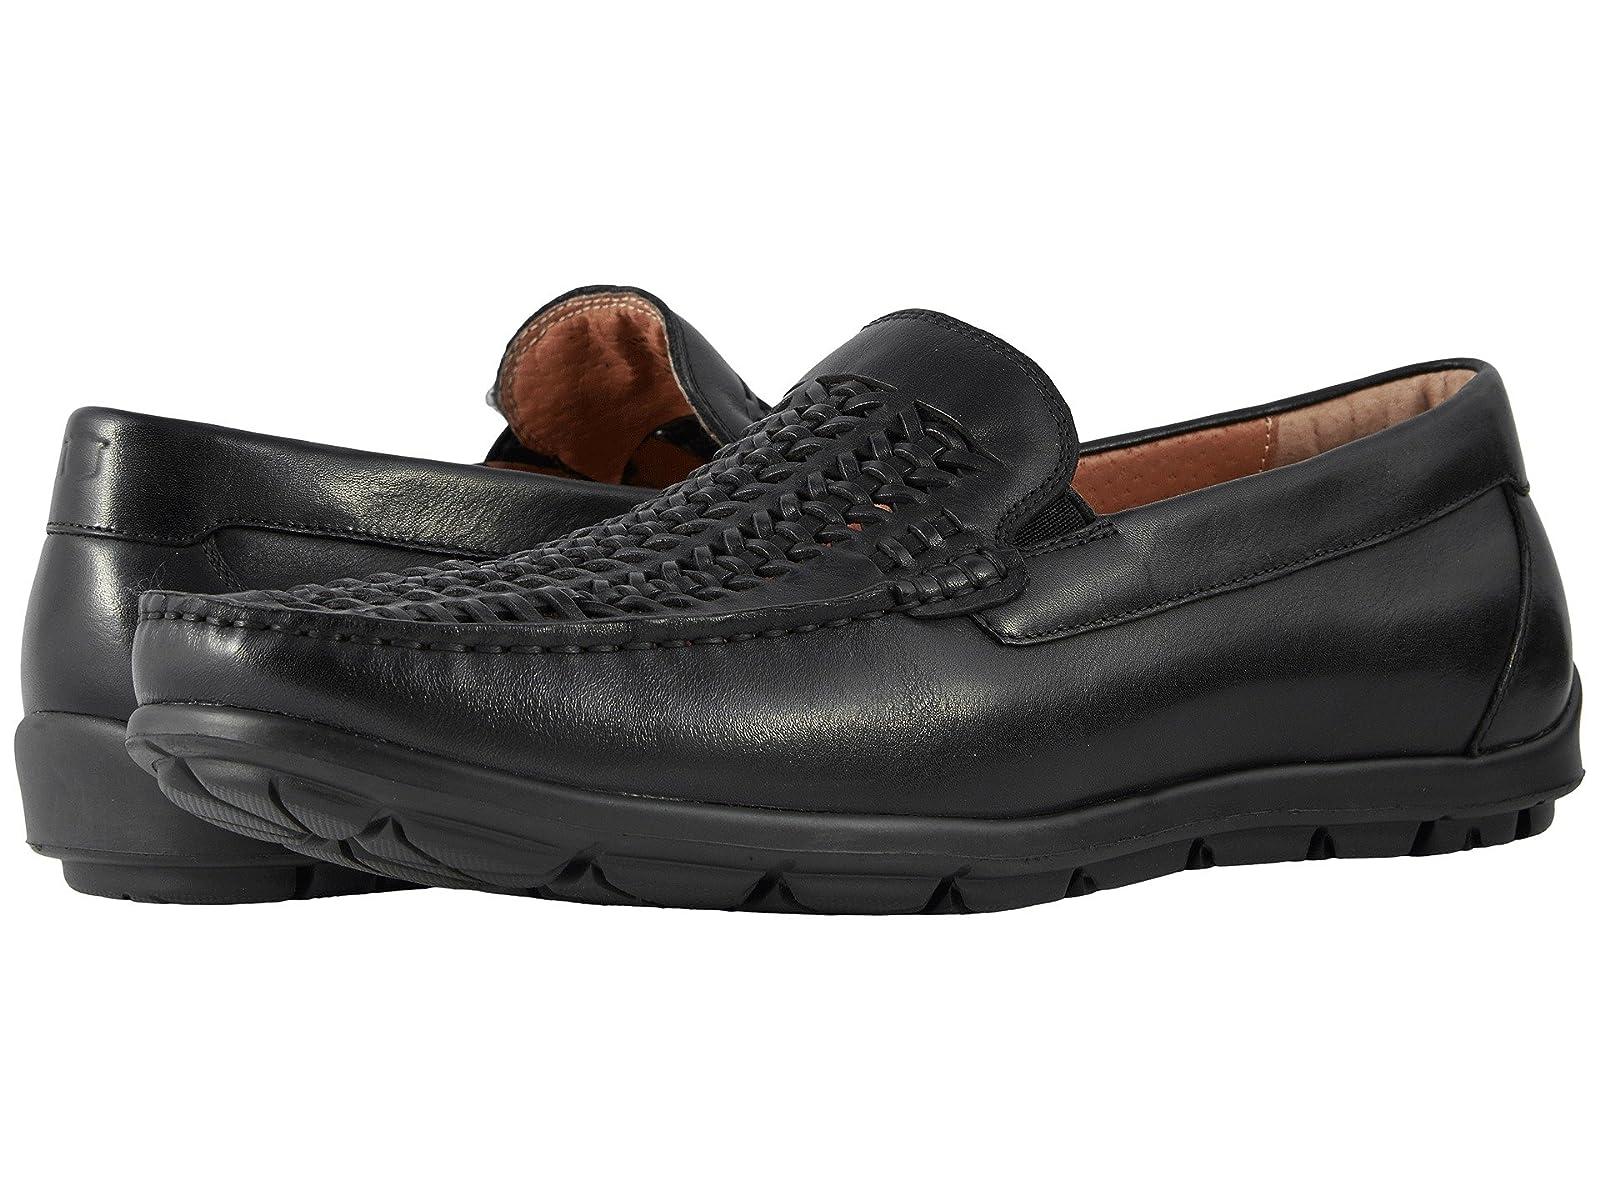 Florsheim Draft Moc Toe Woven Vamp DriverAtmospheric grades have affordable shoes